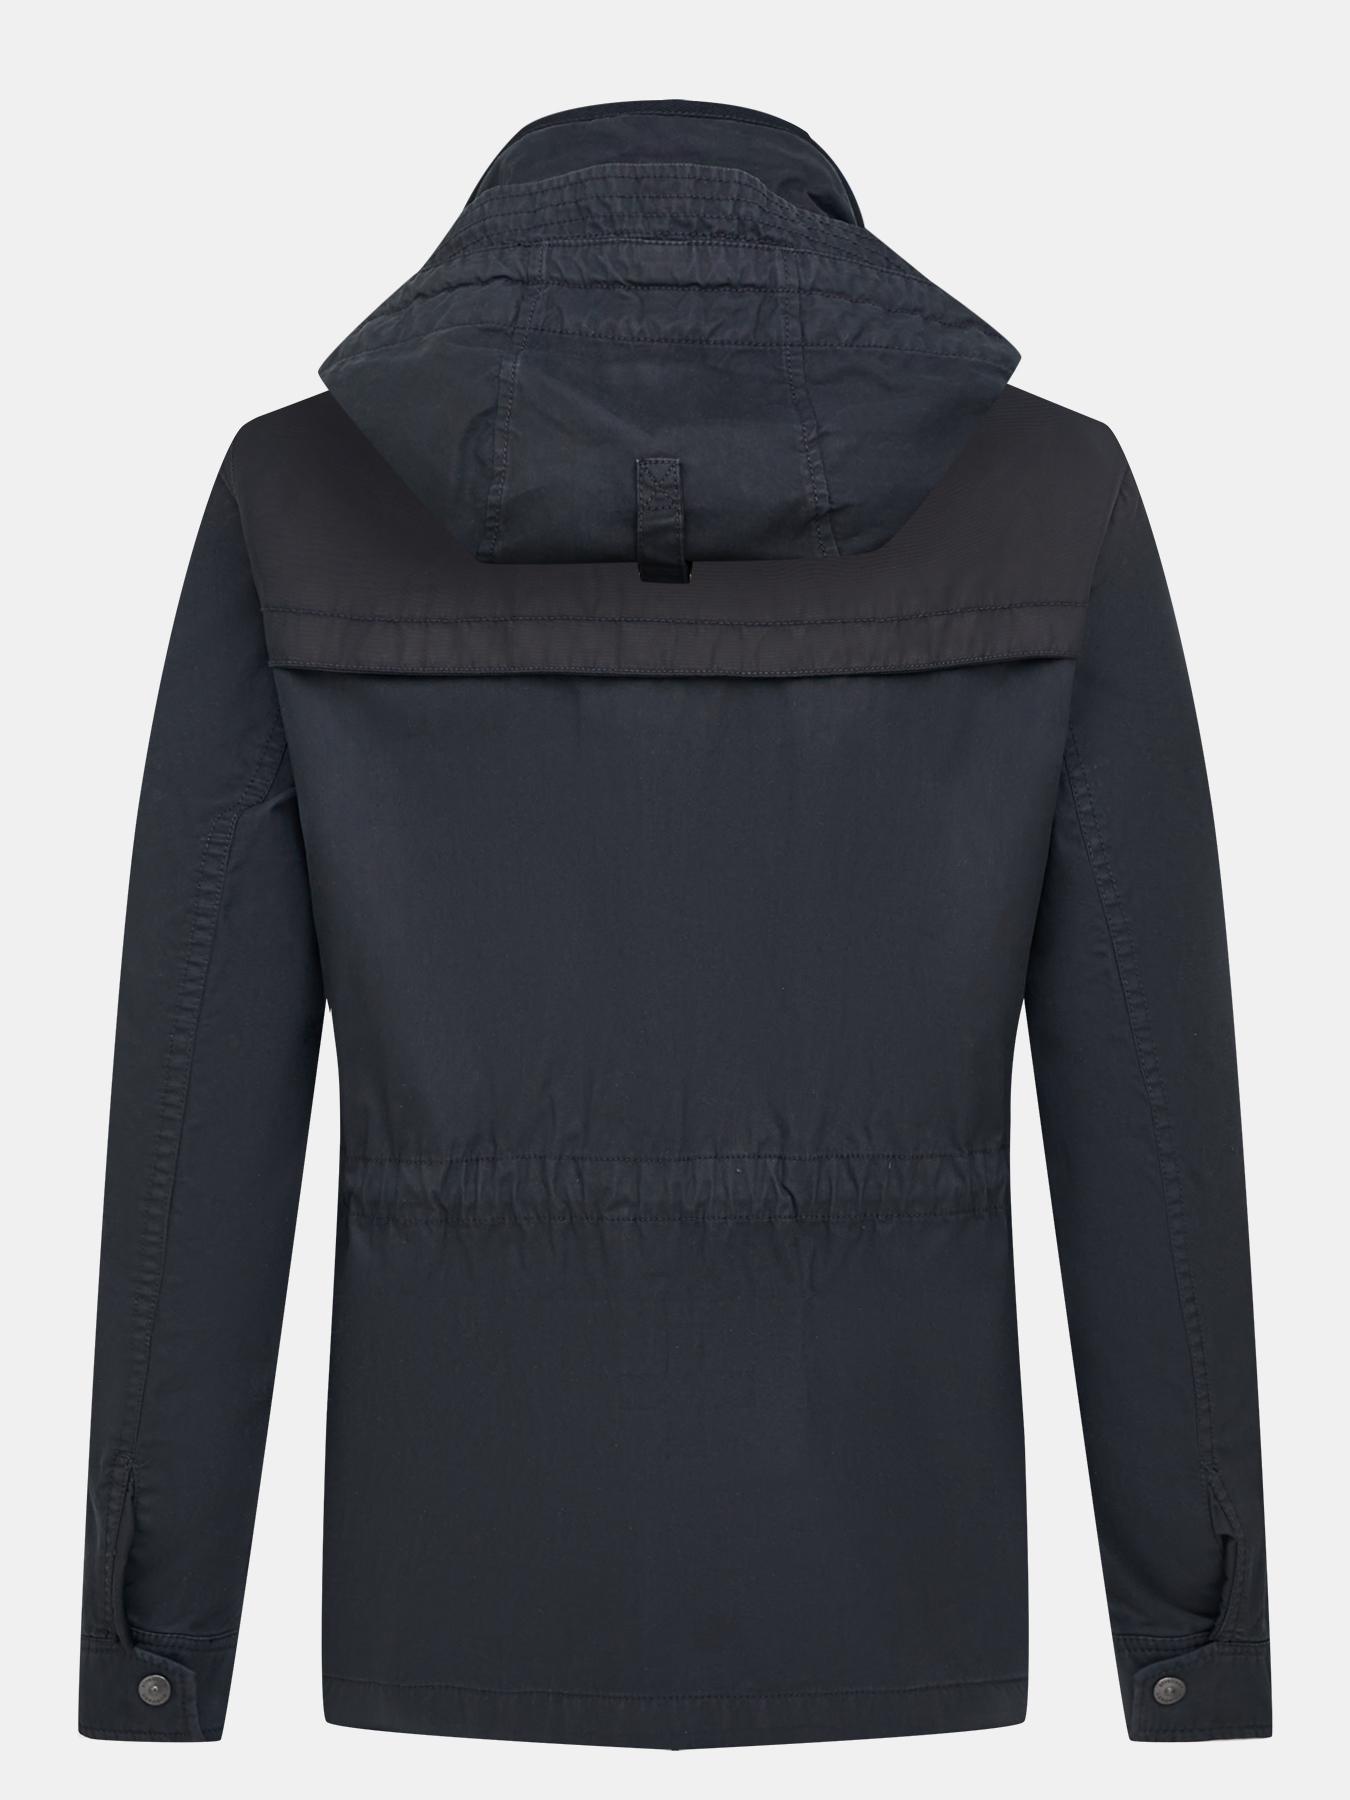 Куртка Strellson Куртка куртка кожаная strellson strellson st004emghji3